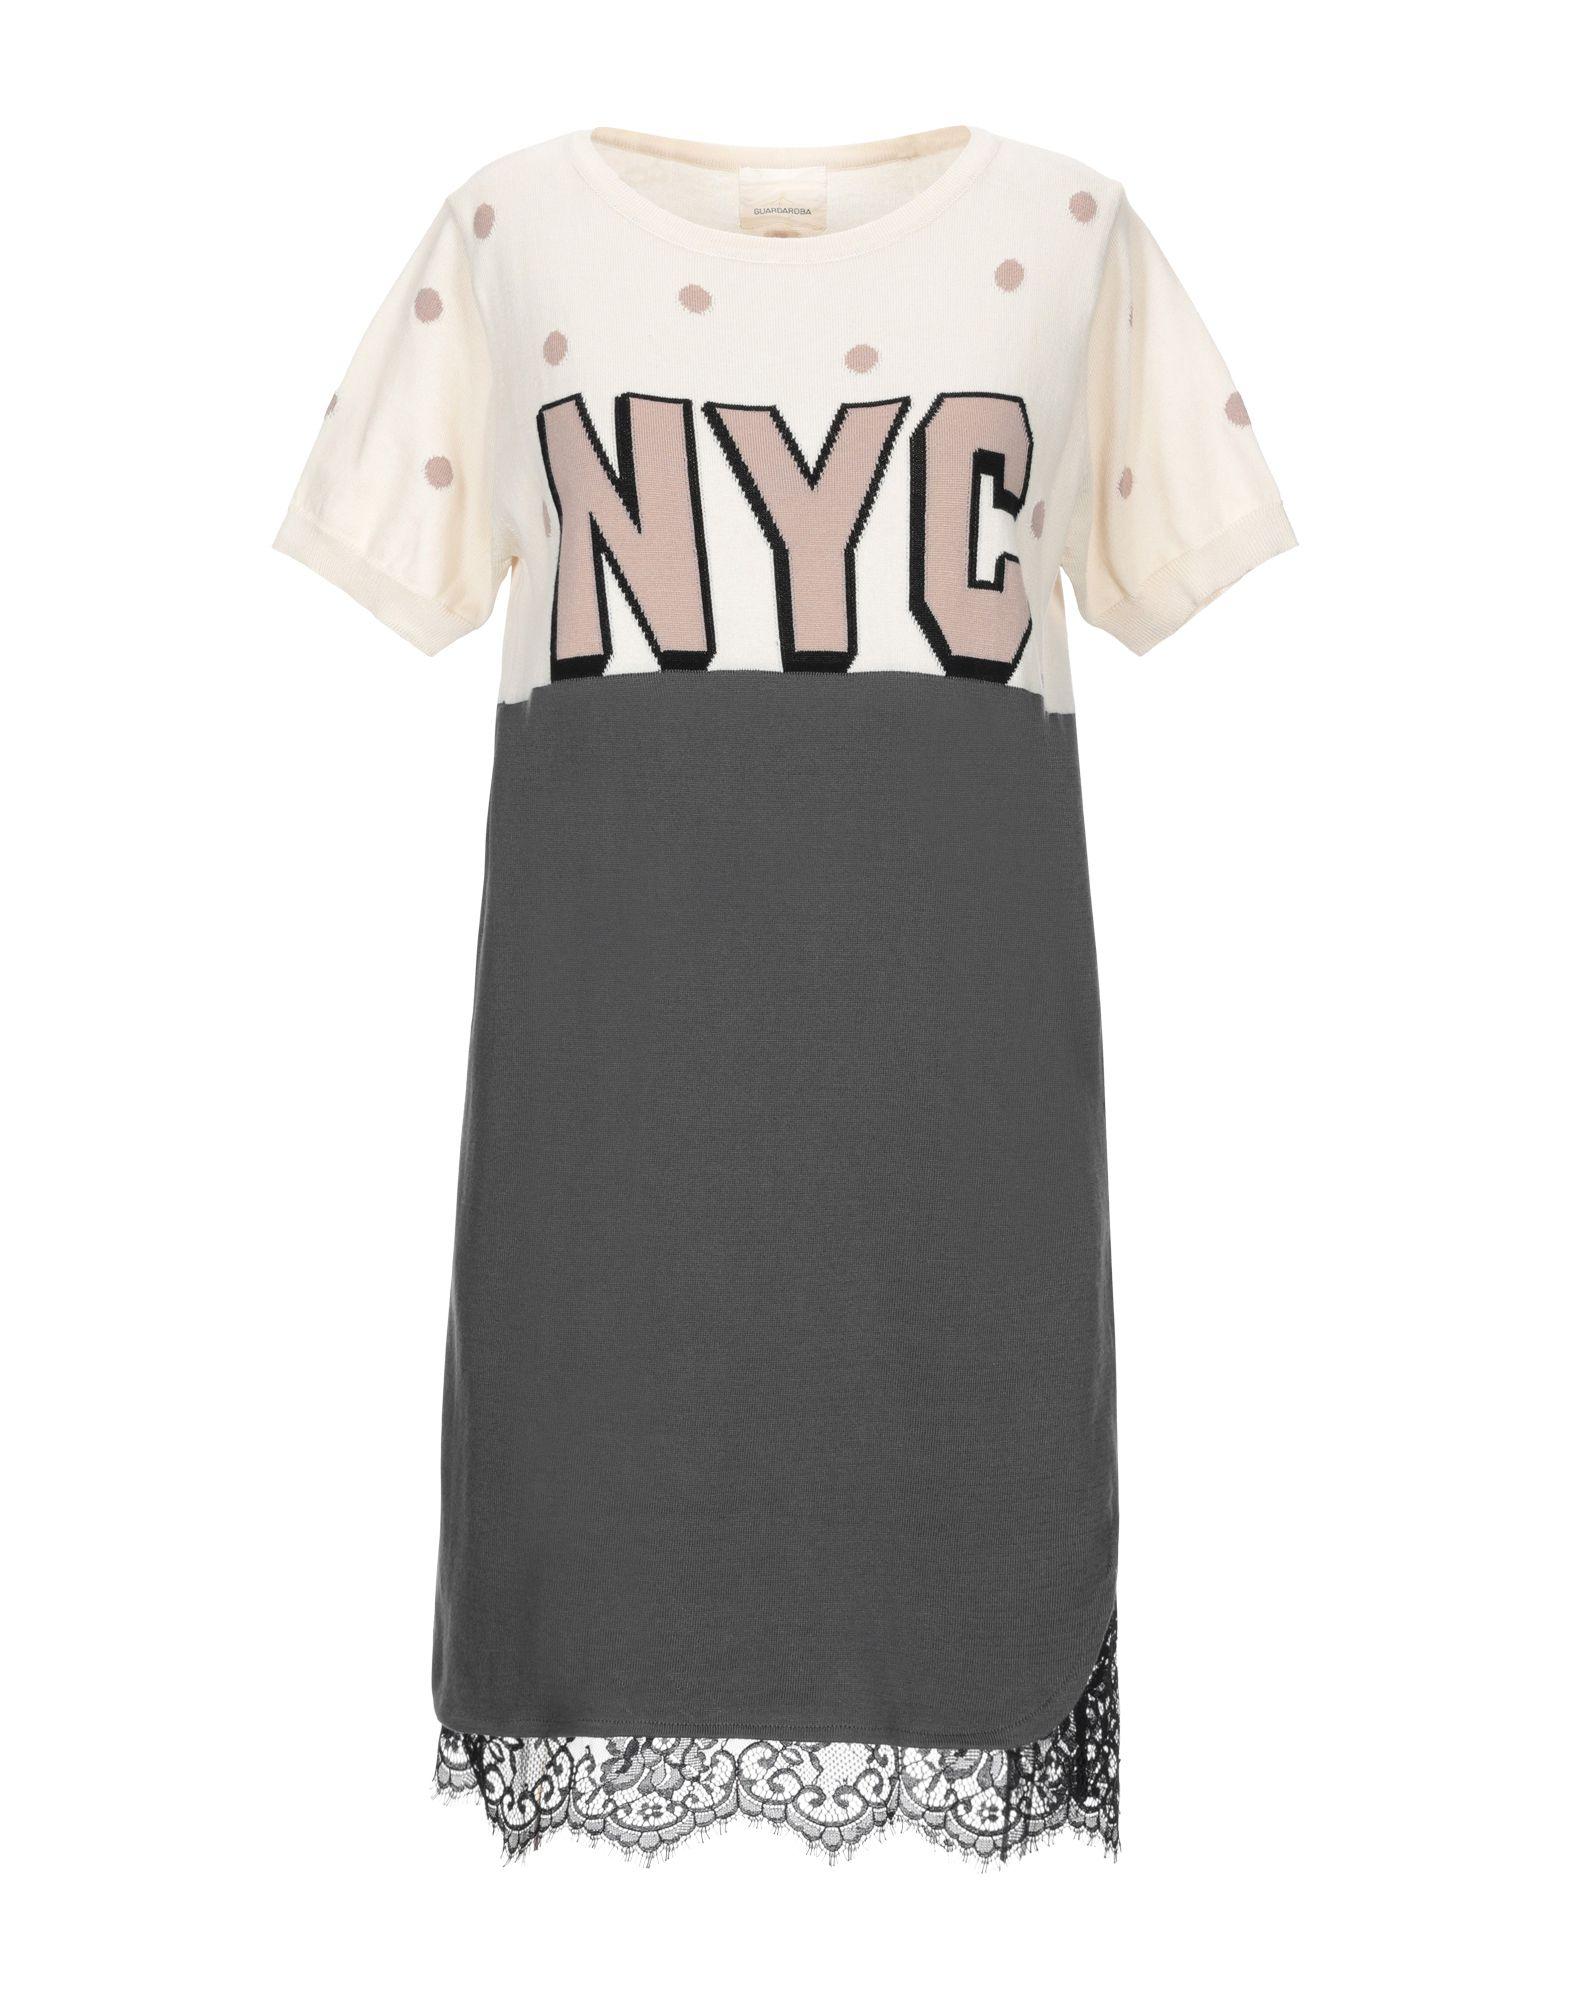 Vestito Corto Guardaroba By Aniye By By donna - 34927458NS  Online-Mode einkaufen